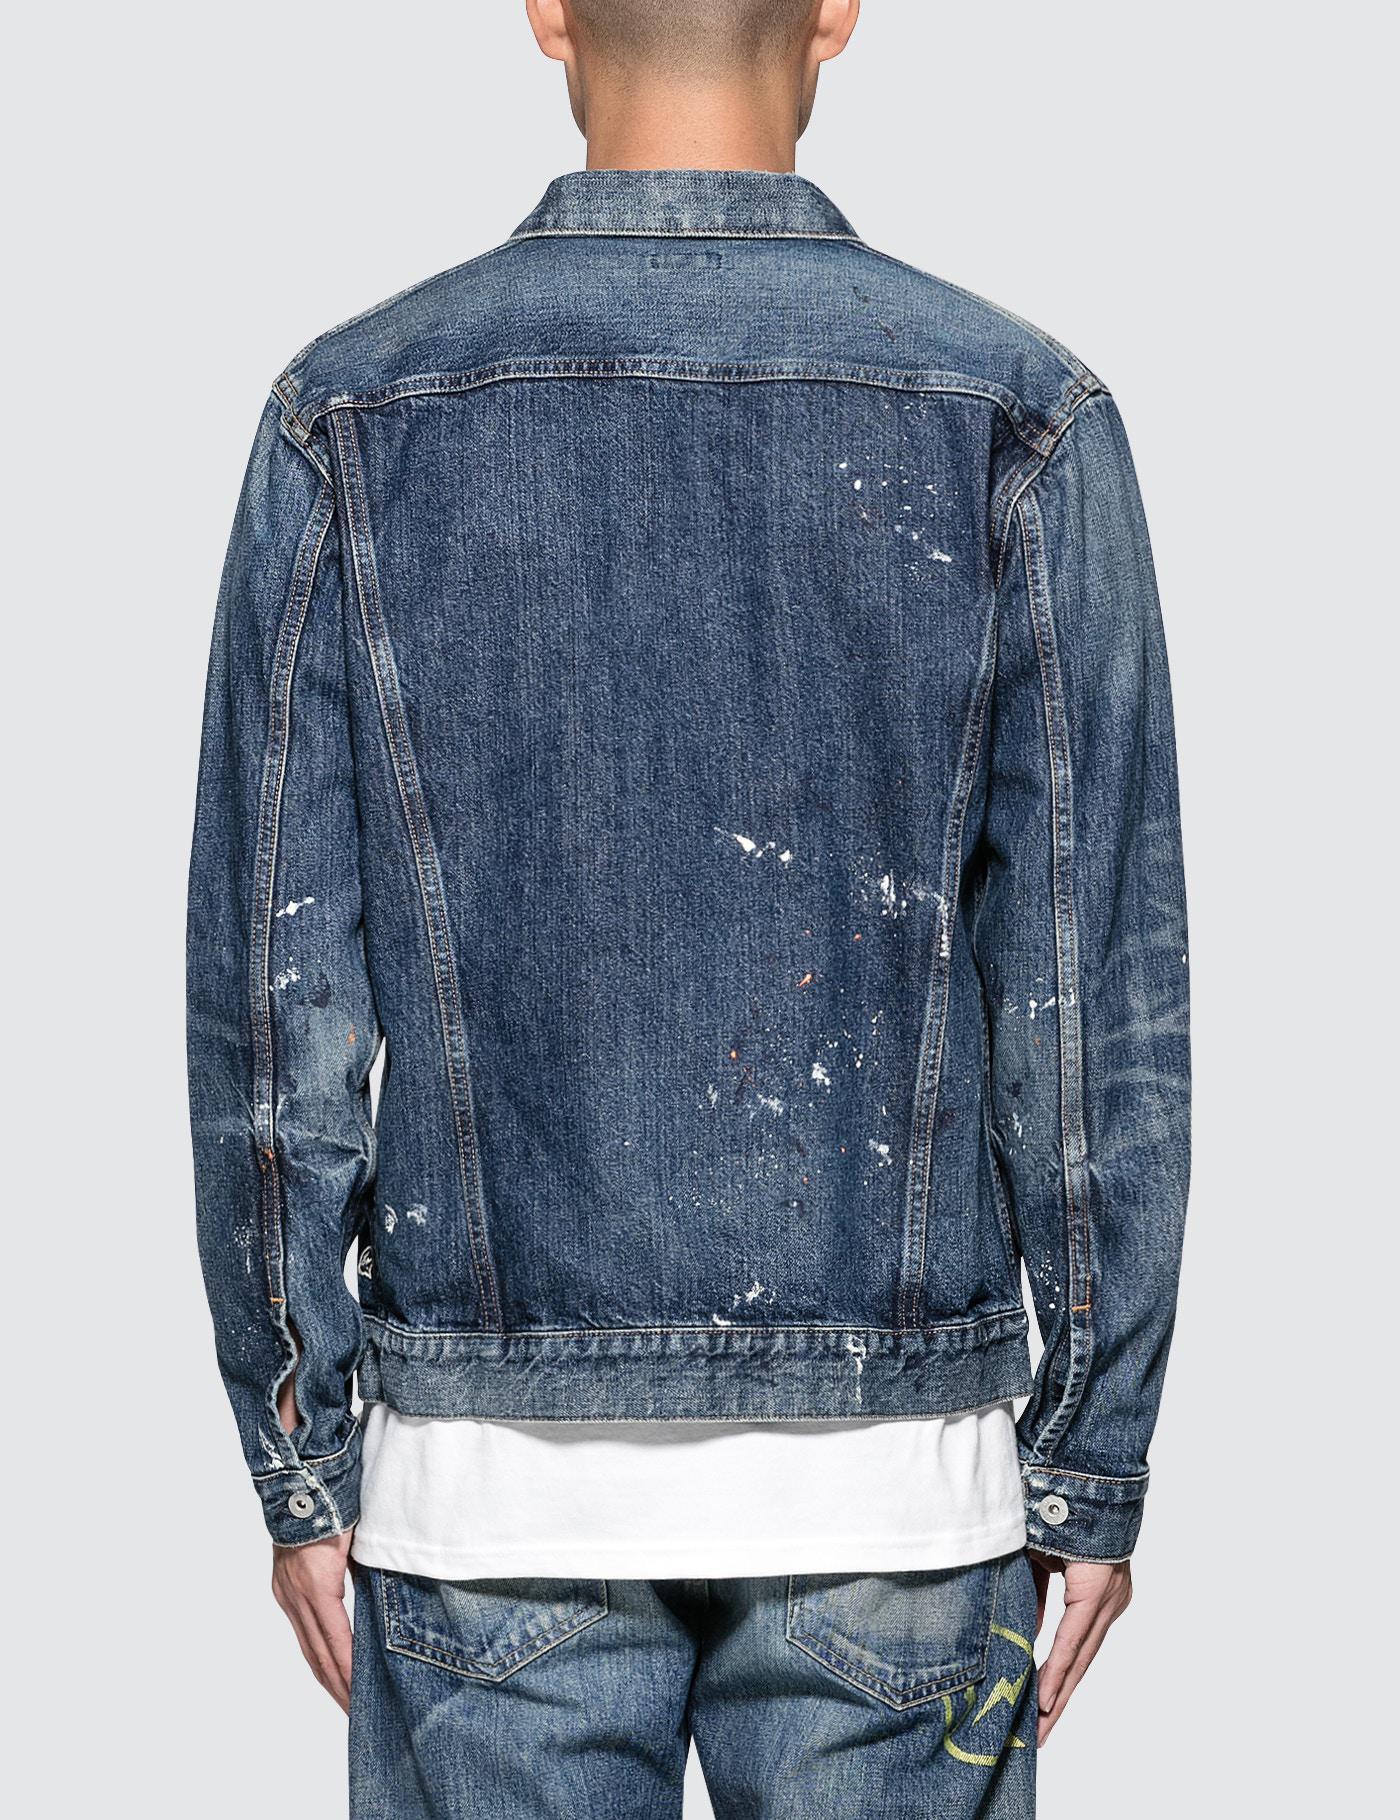 Denim by Vanquish & Fragment Paint Denim Jacket in Washed Indigo (Blue) for Men